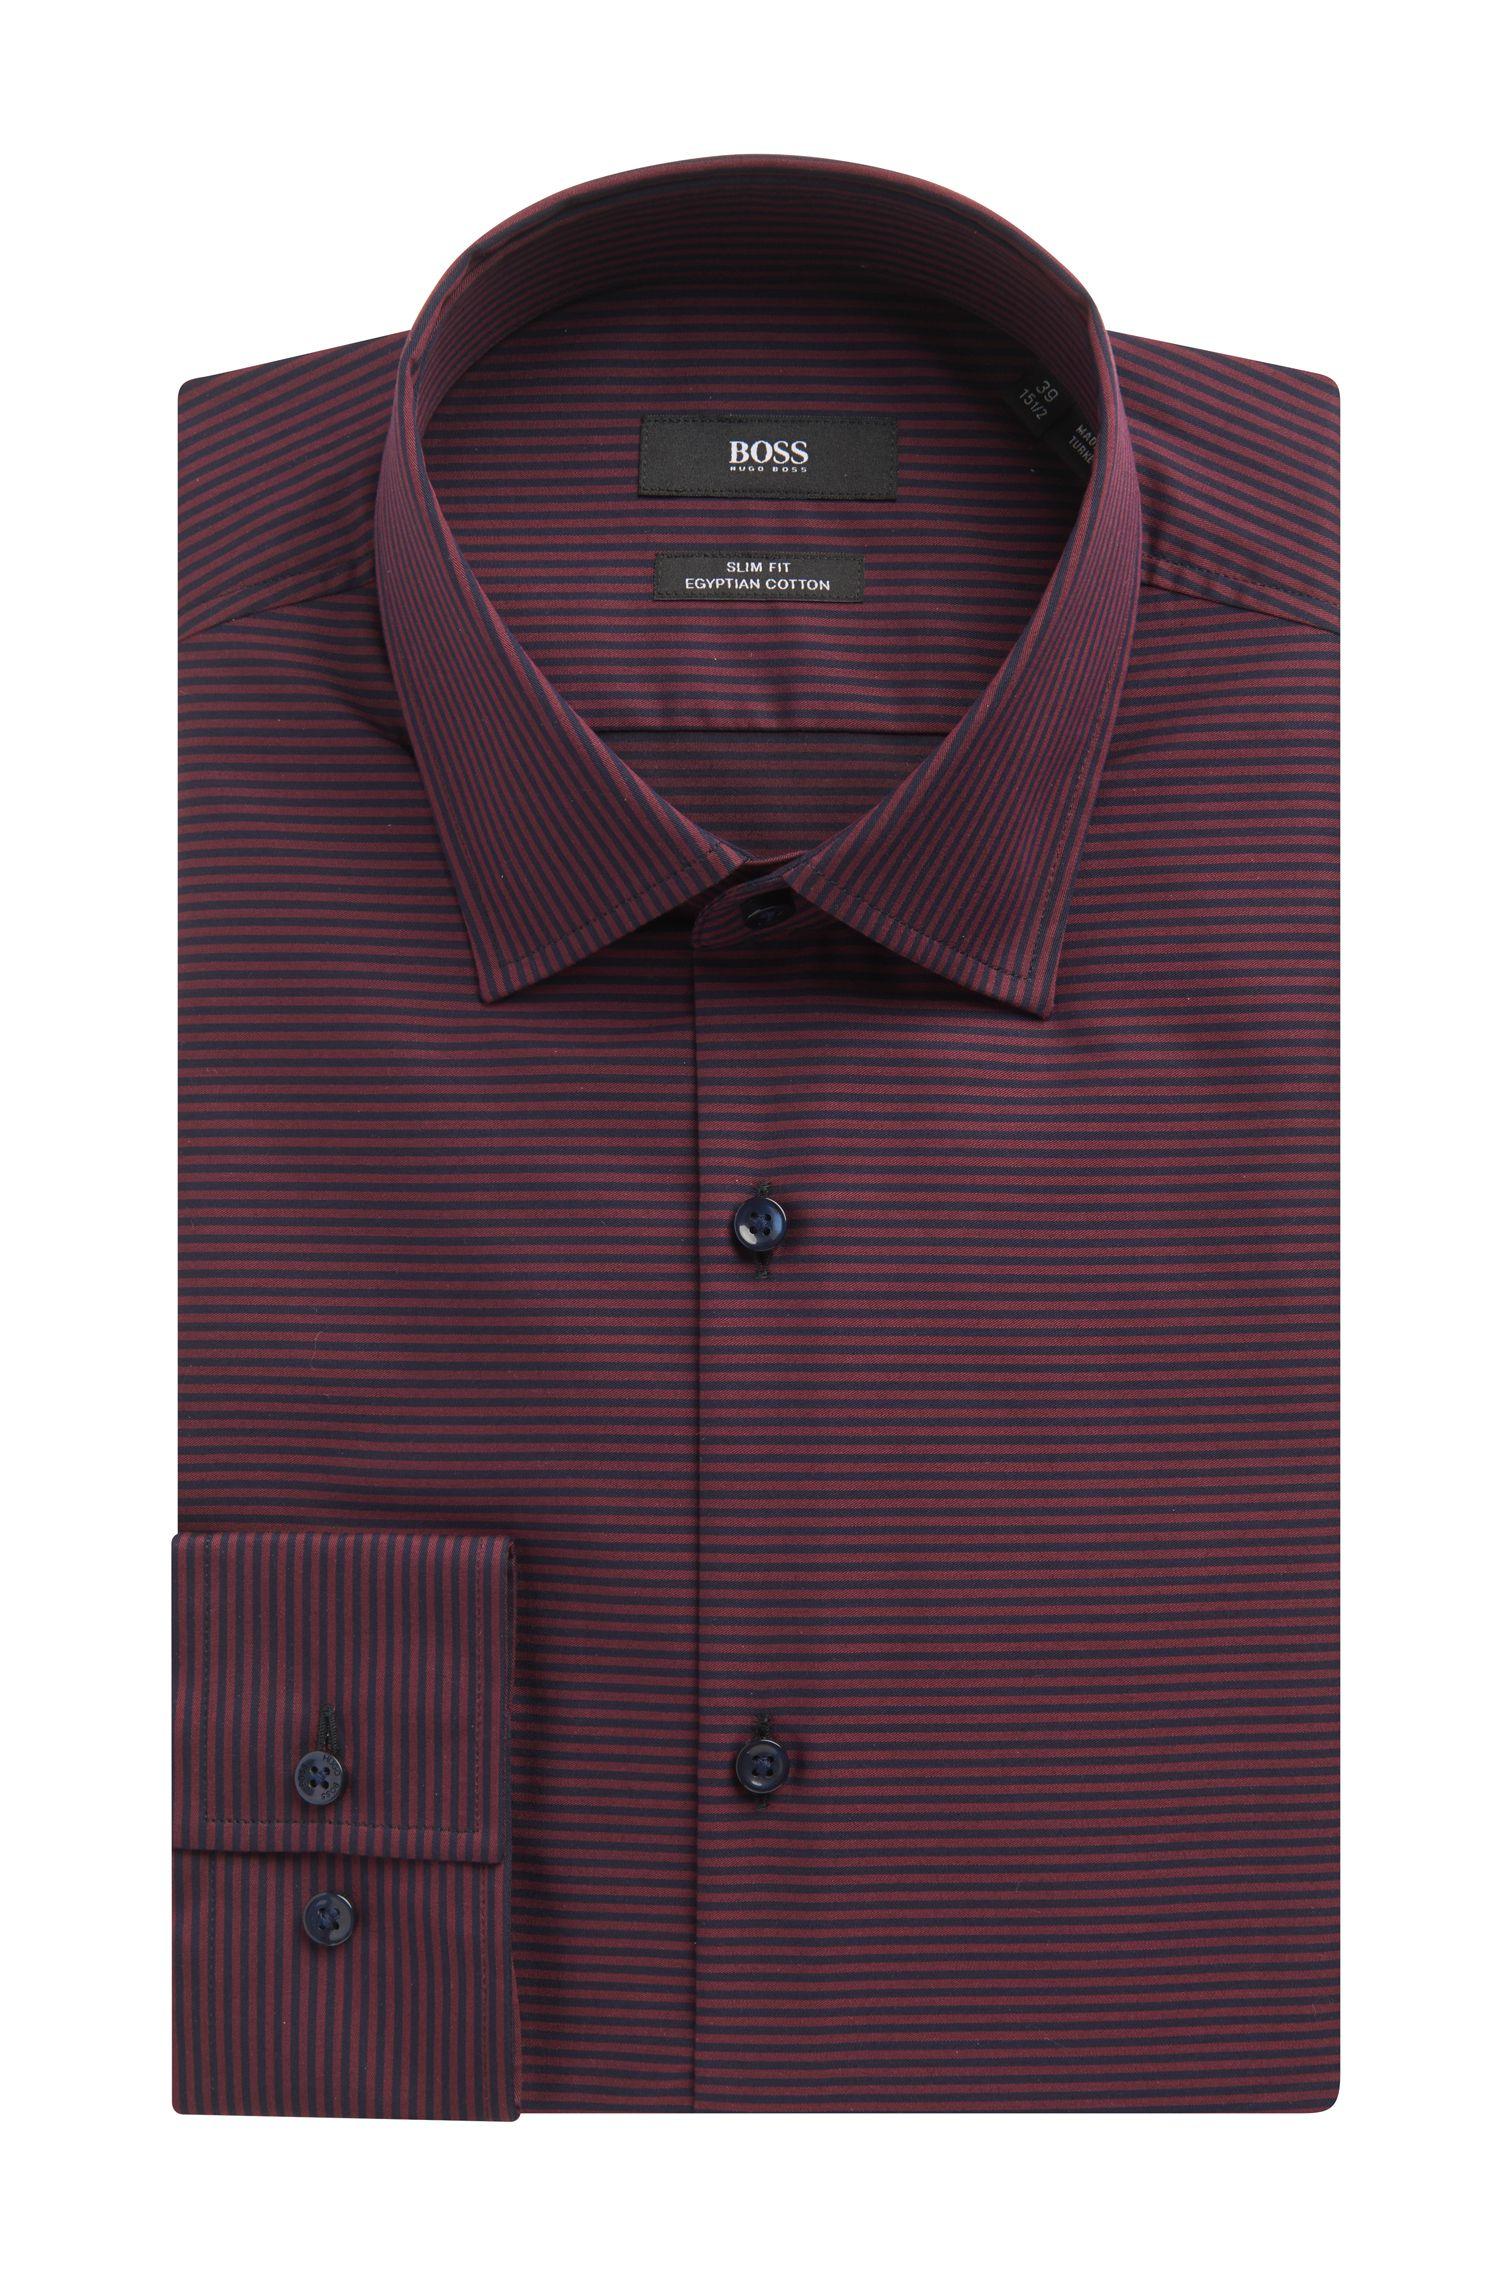 Cotton Dress Shirt, Slim Fit | Jamar